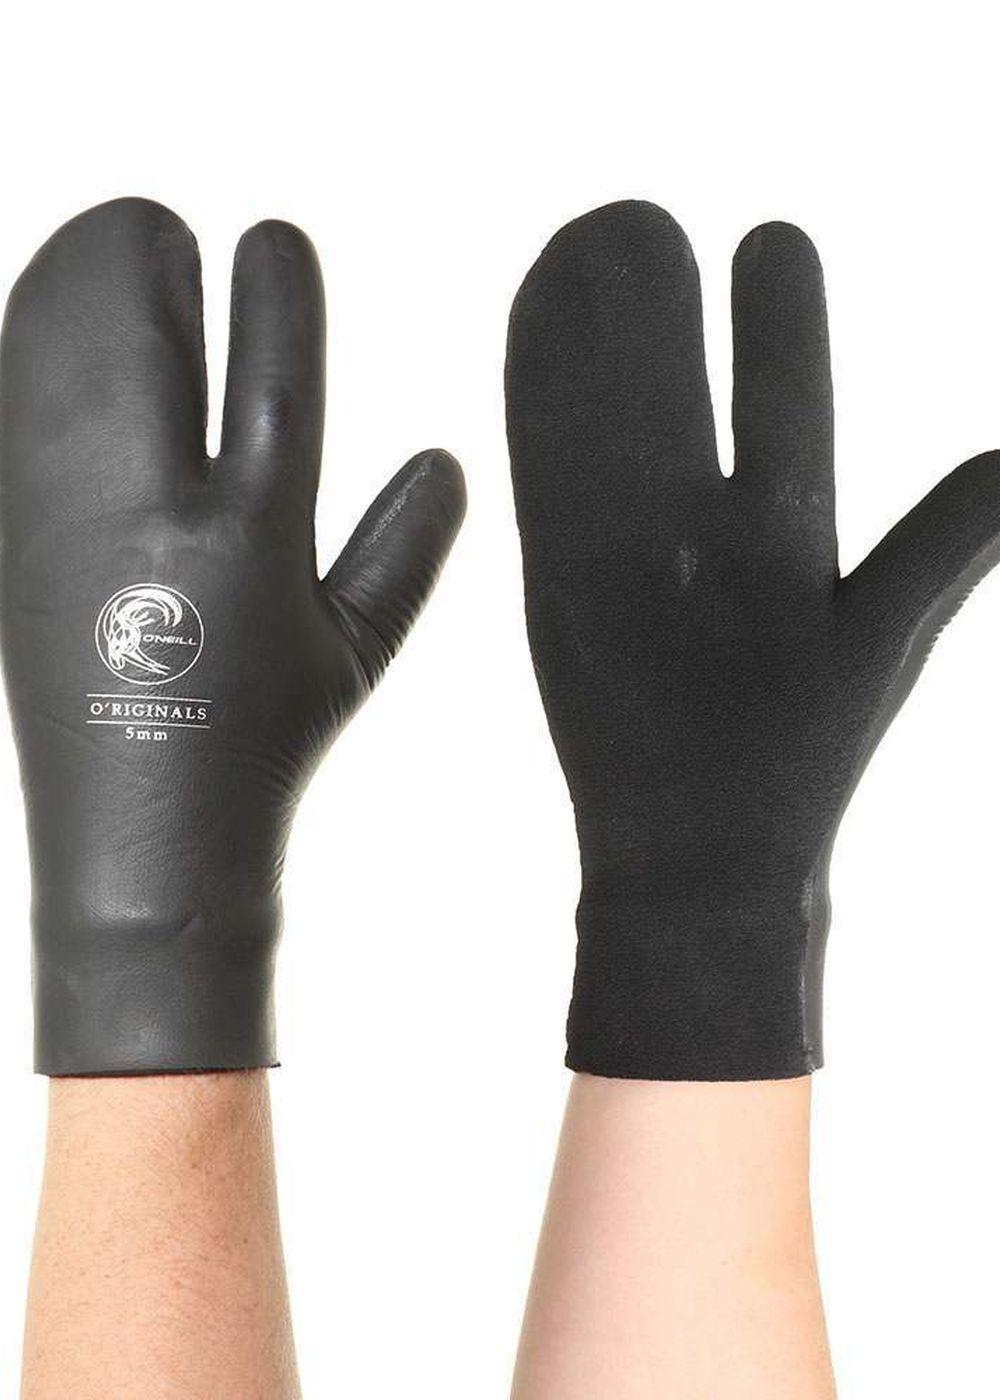 Image of ONeill Original 5MM Lobster Gloves Black